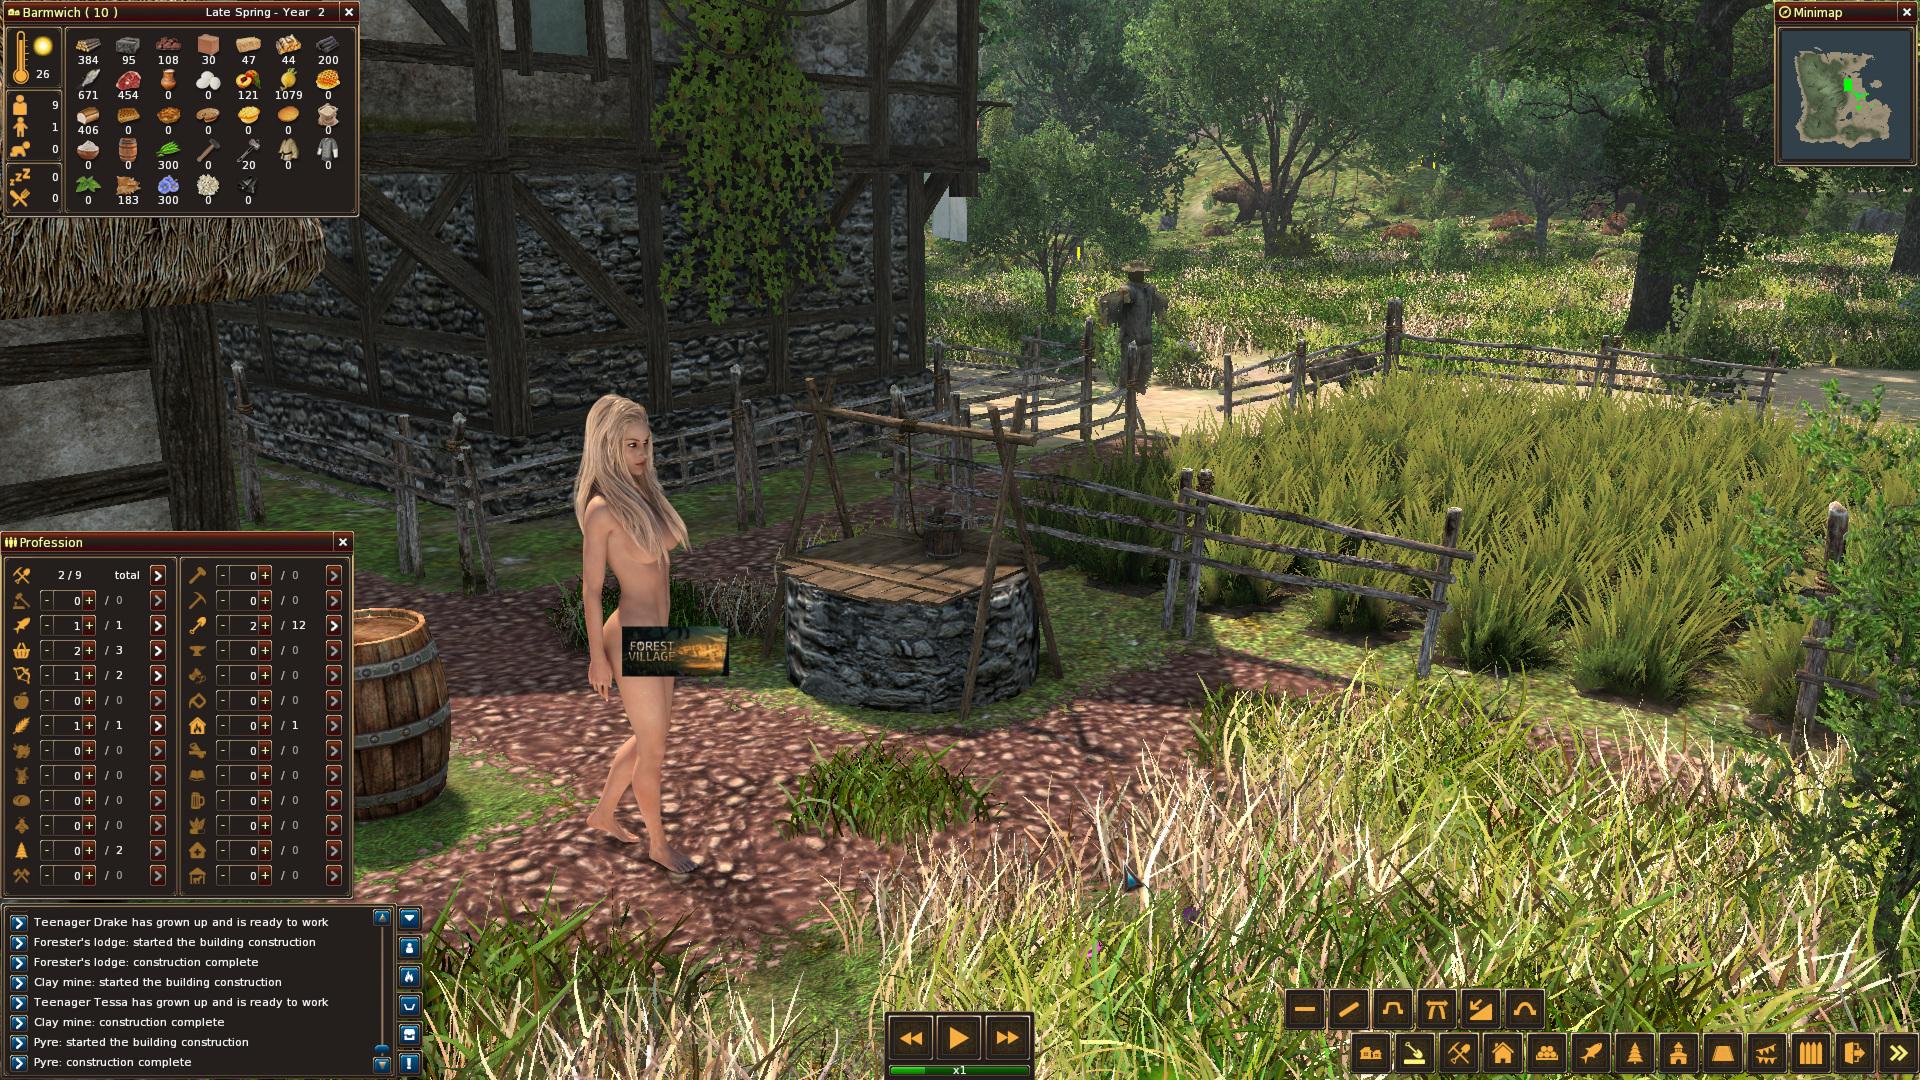 Life is feudal forest village donkey farm ролевая игра по наруто и